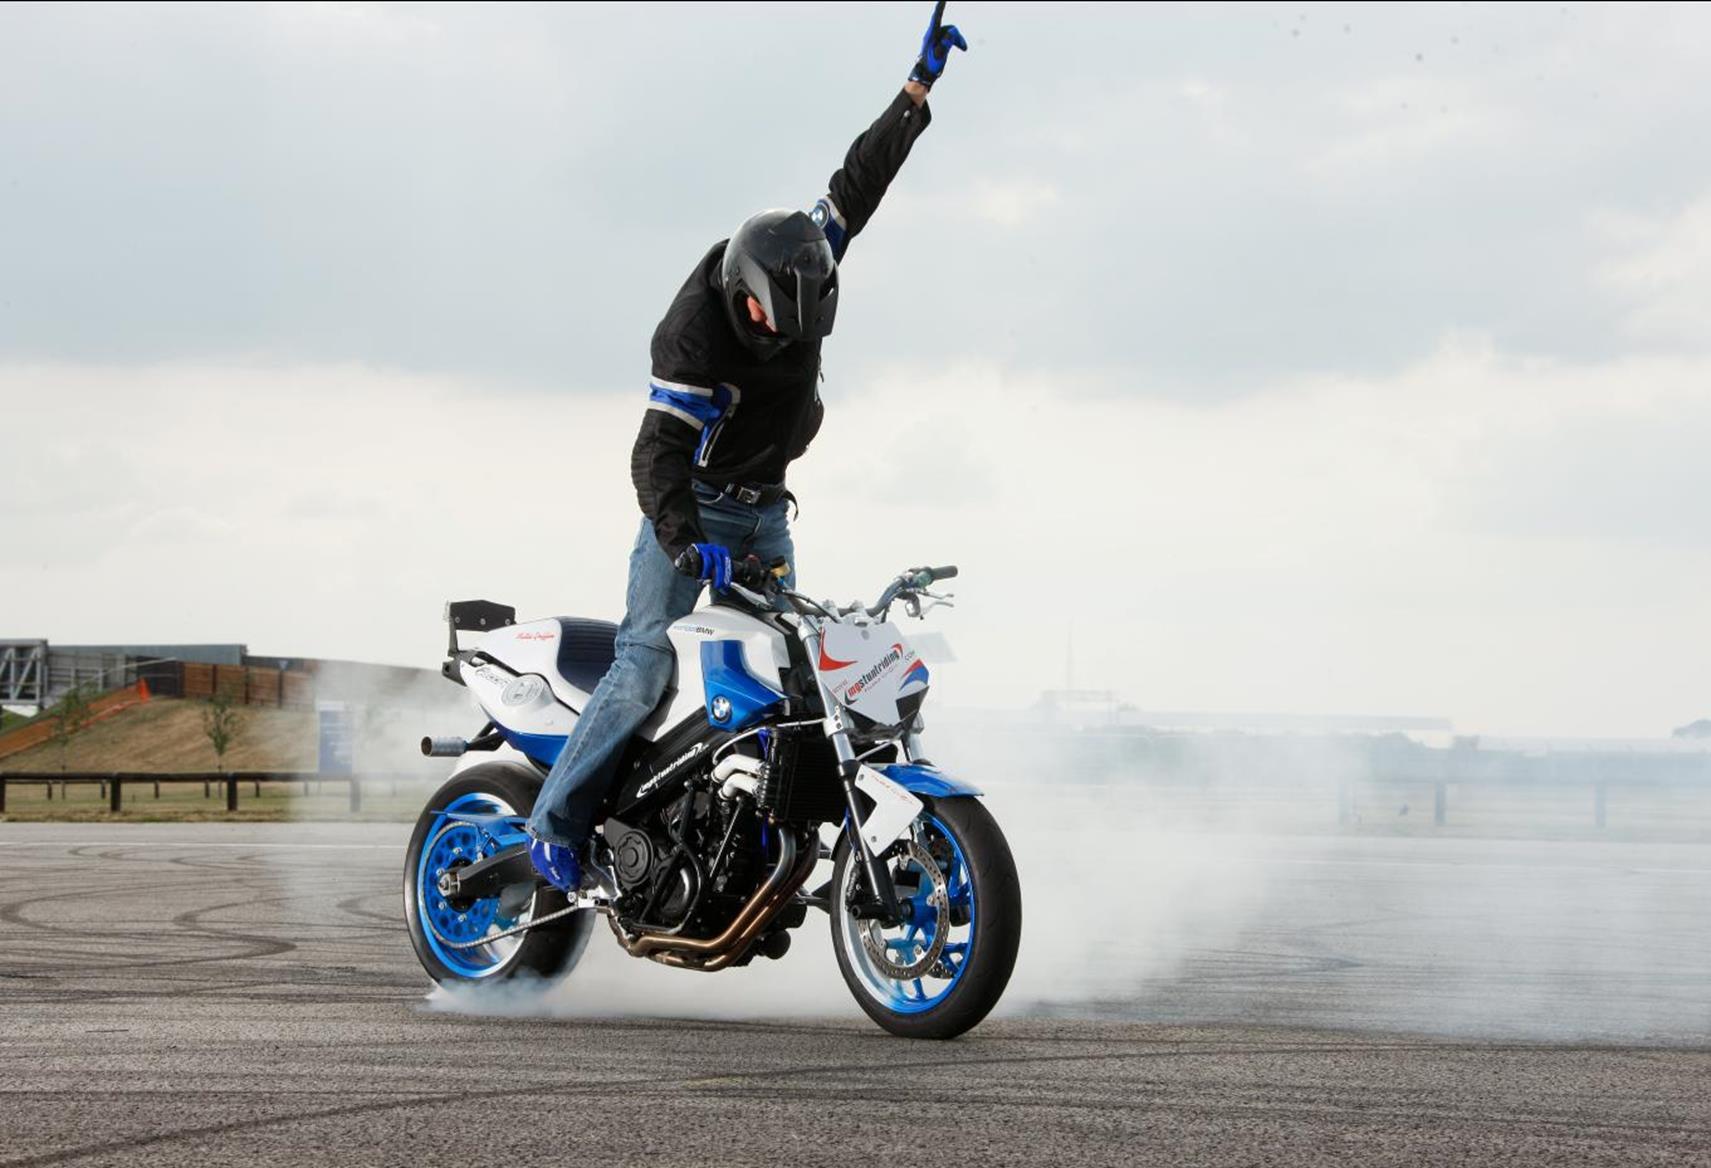 Bmw Motorcycles Peterborough